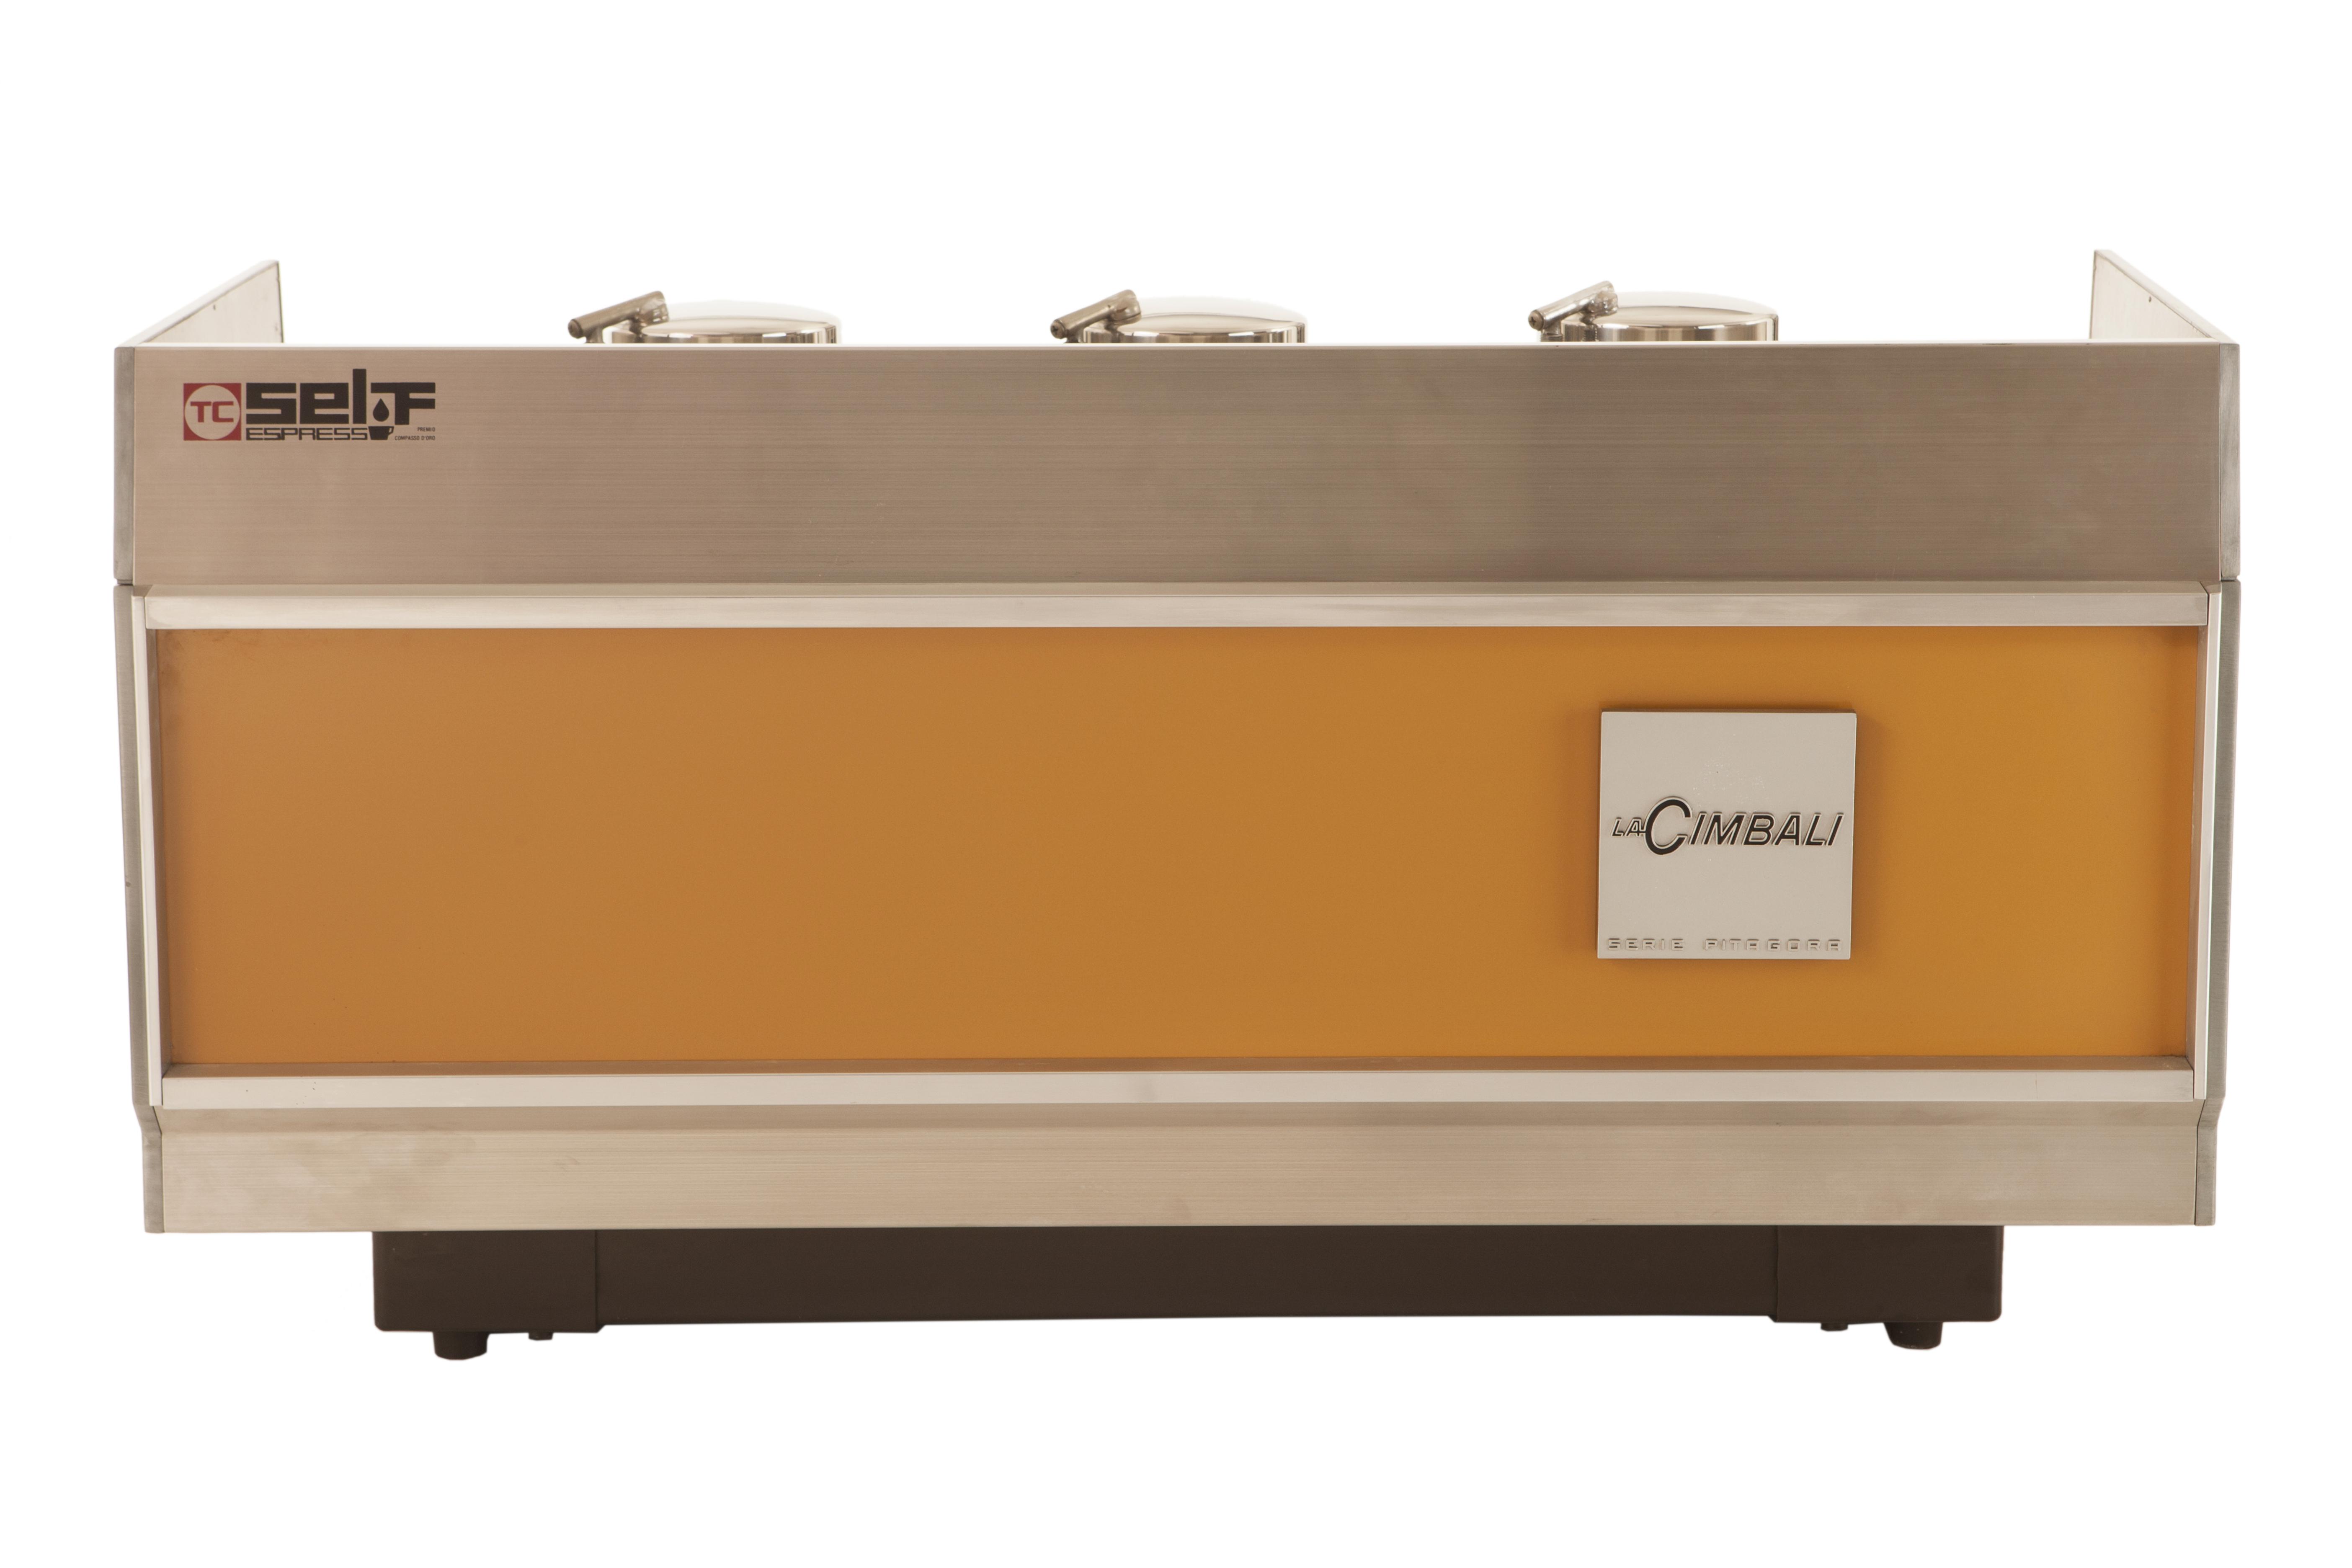 Italian Espresso Machine >> MUMAC: a tribute to coffee machines by Cimbali Group - Italian Good News